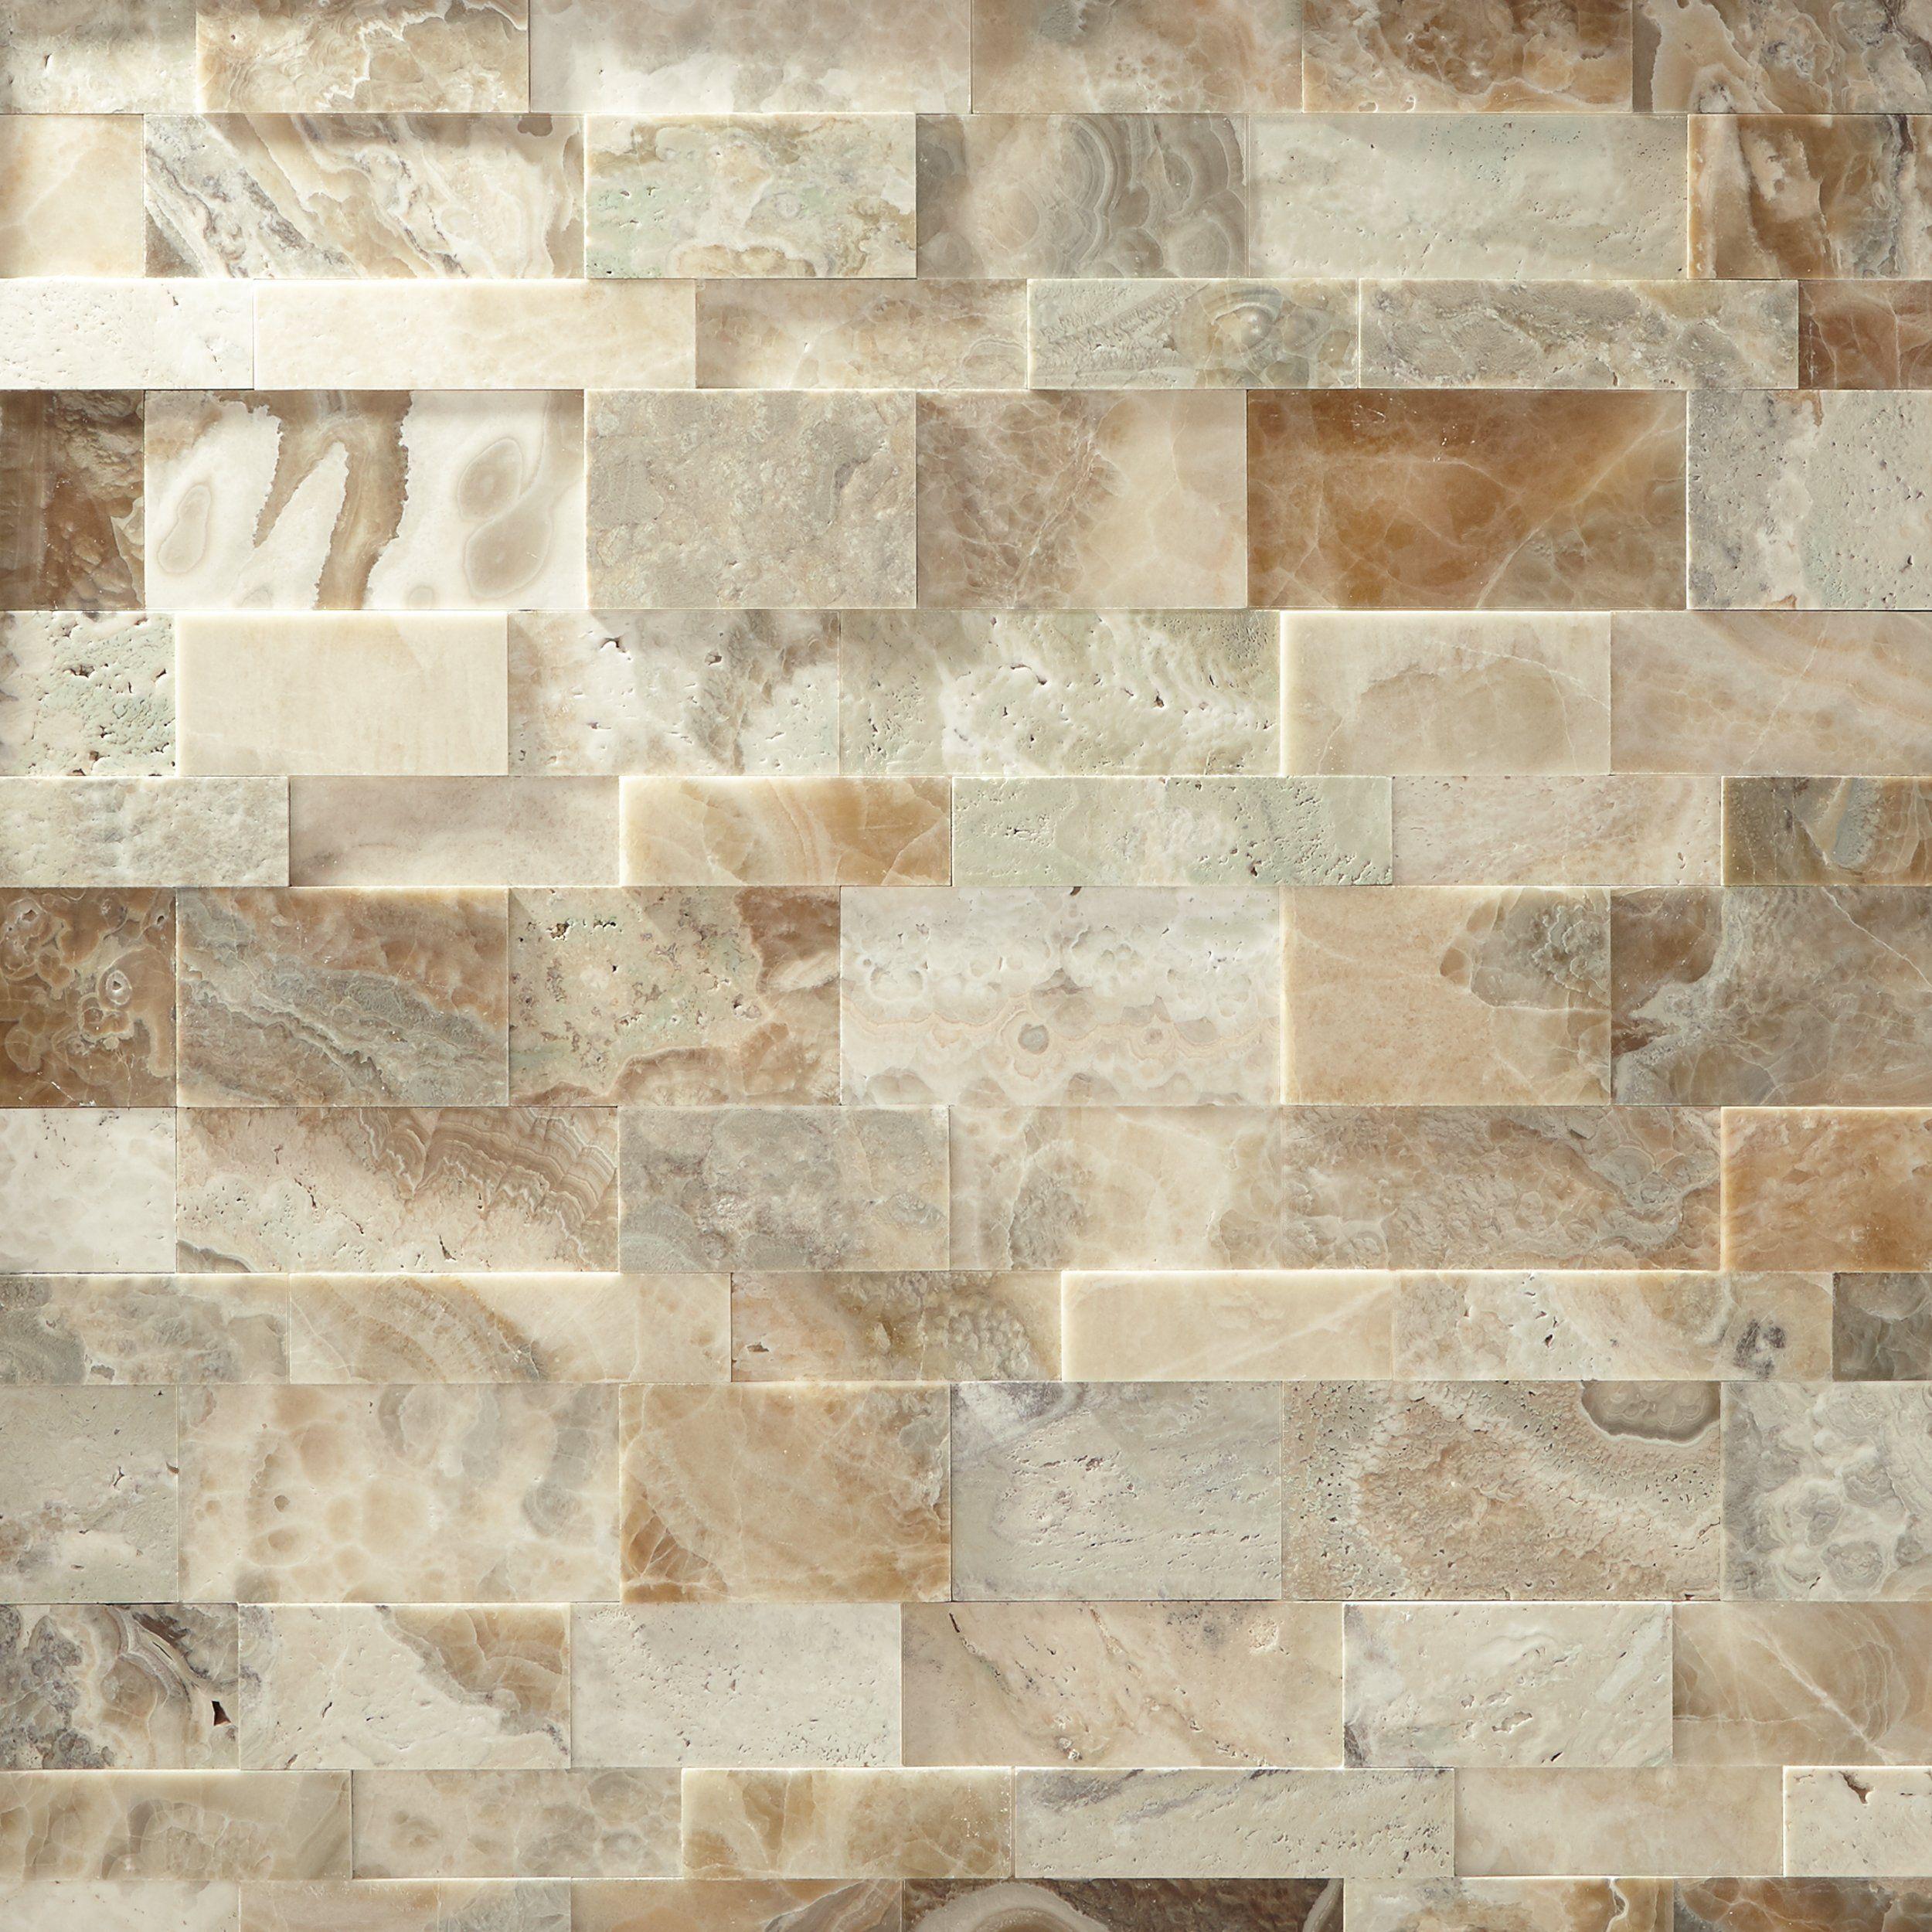 Blue Ridge Random Limestone Panel Ledger Travertine Stacked Stone Brick Effect Wall Tiles